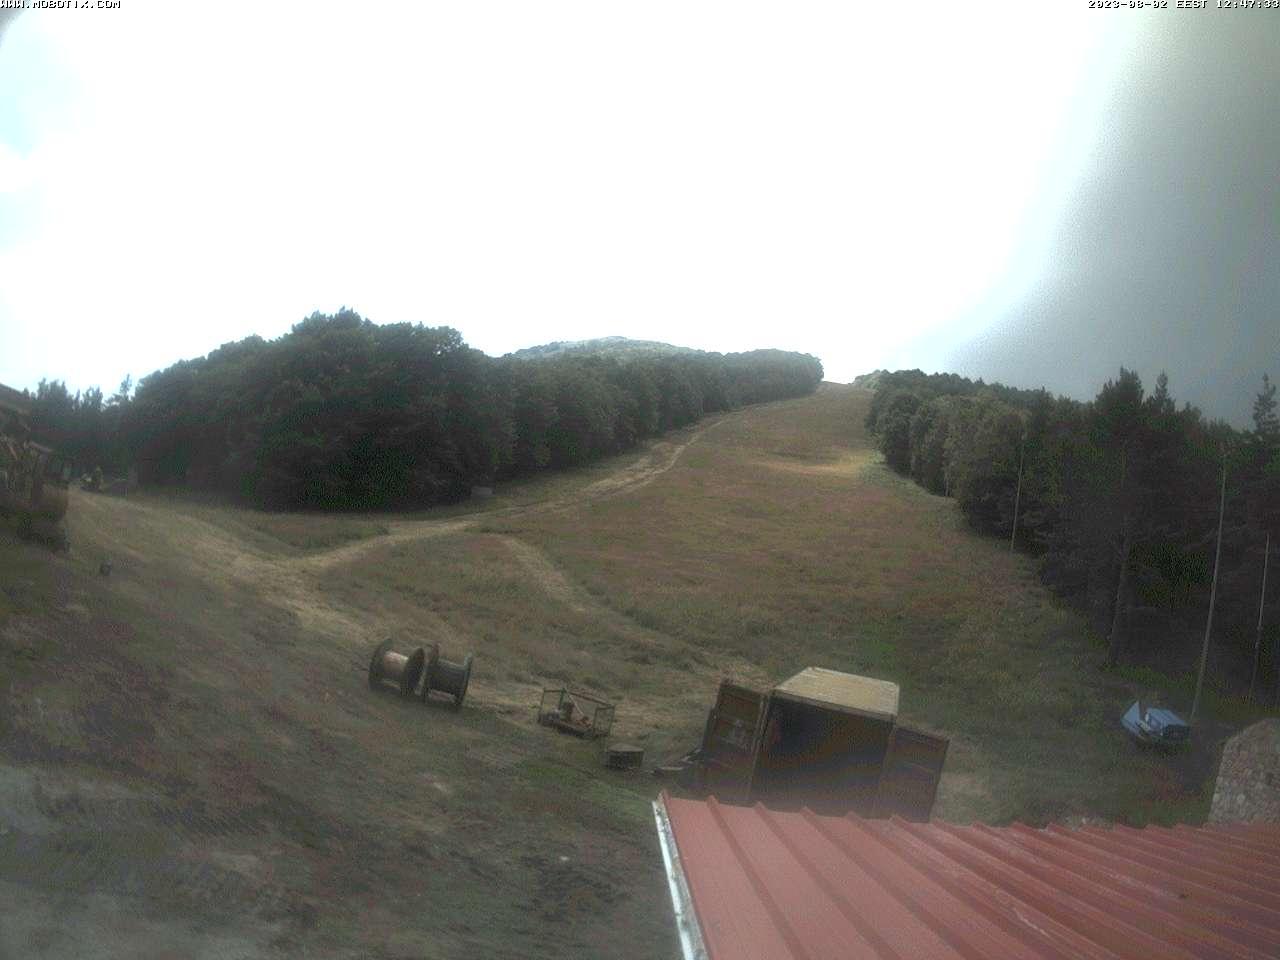 Webcam Λαϊλιάς (Χιονοδρομικό Κέντρο)